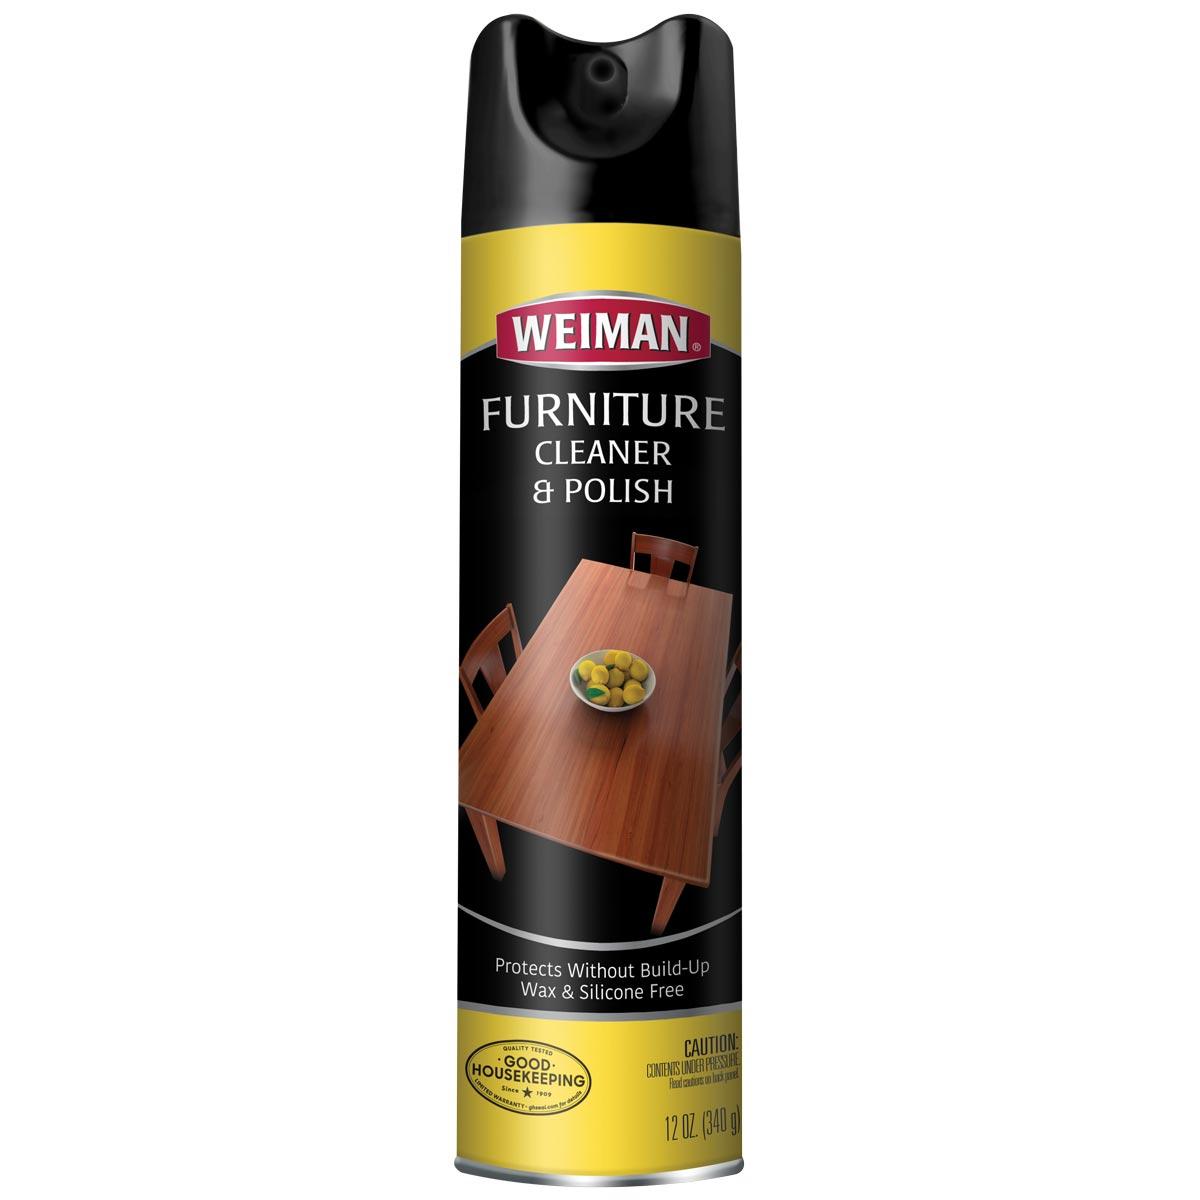 https://googone.com/media/catalog/product/w/e/weiman-furniture-cleaner-_-polish_front.jpg